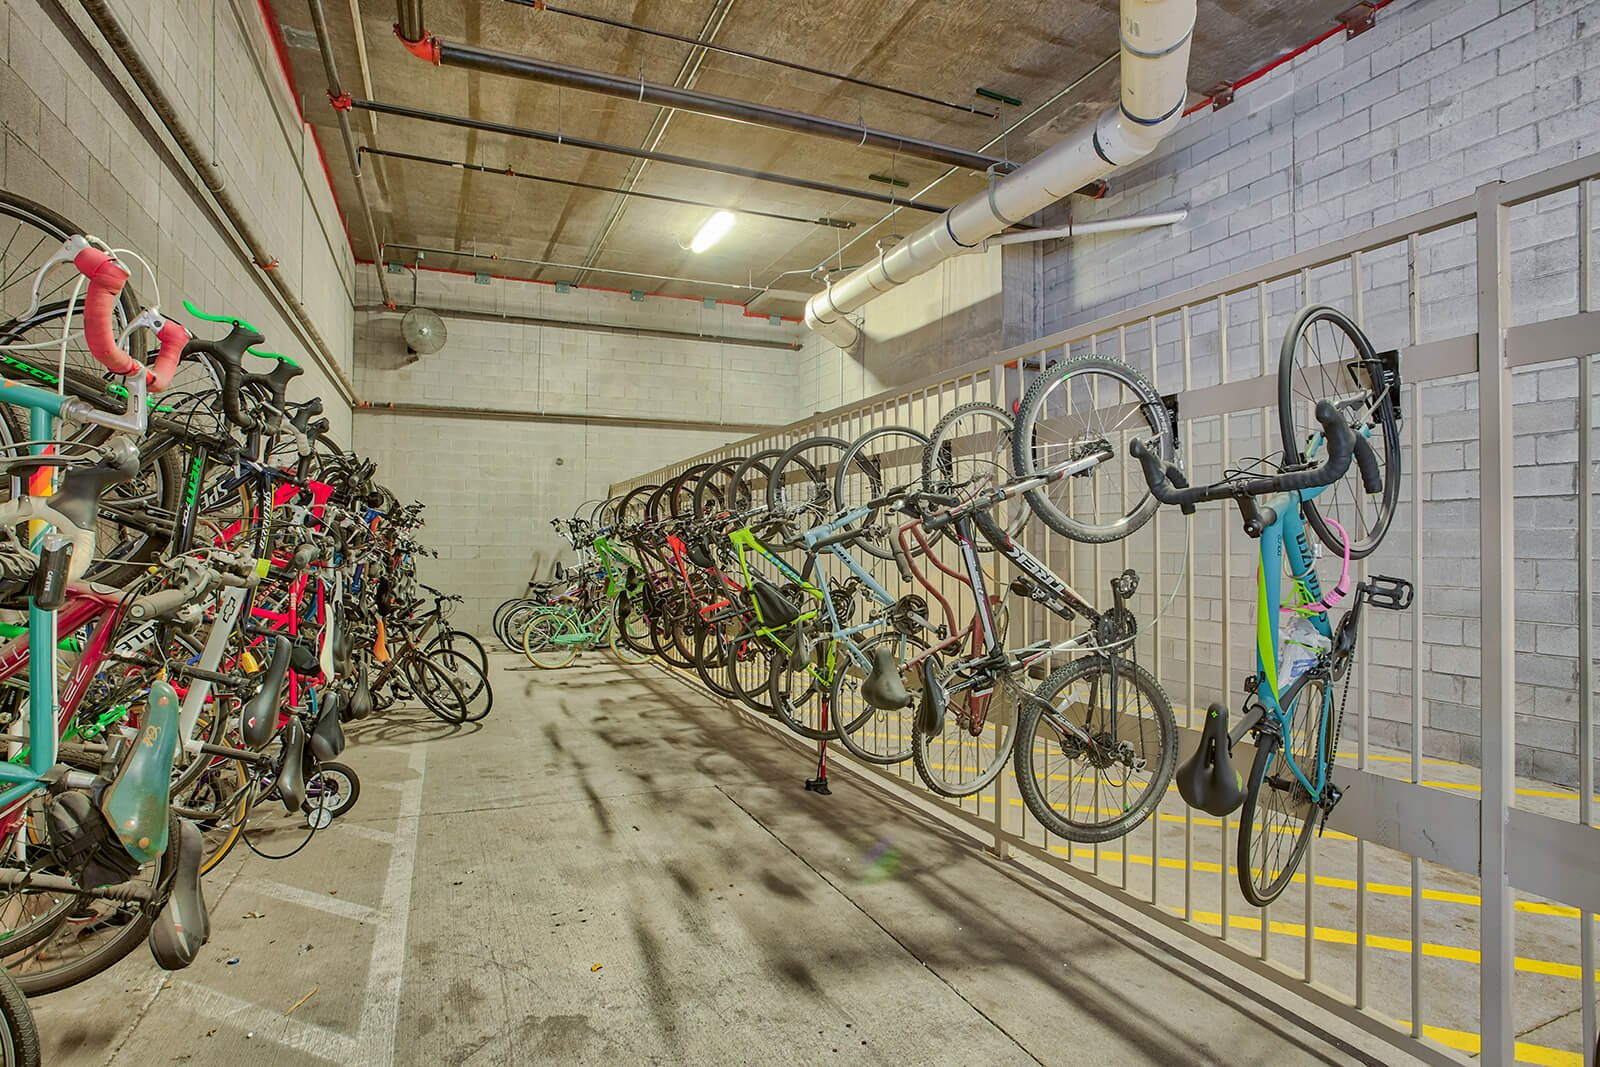 Bike Racks at Glass House by Windsor, Dallas, TX